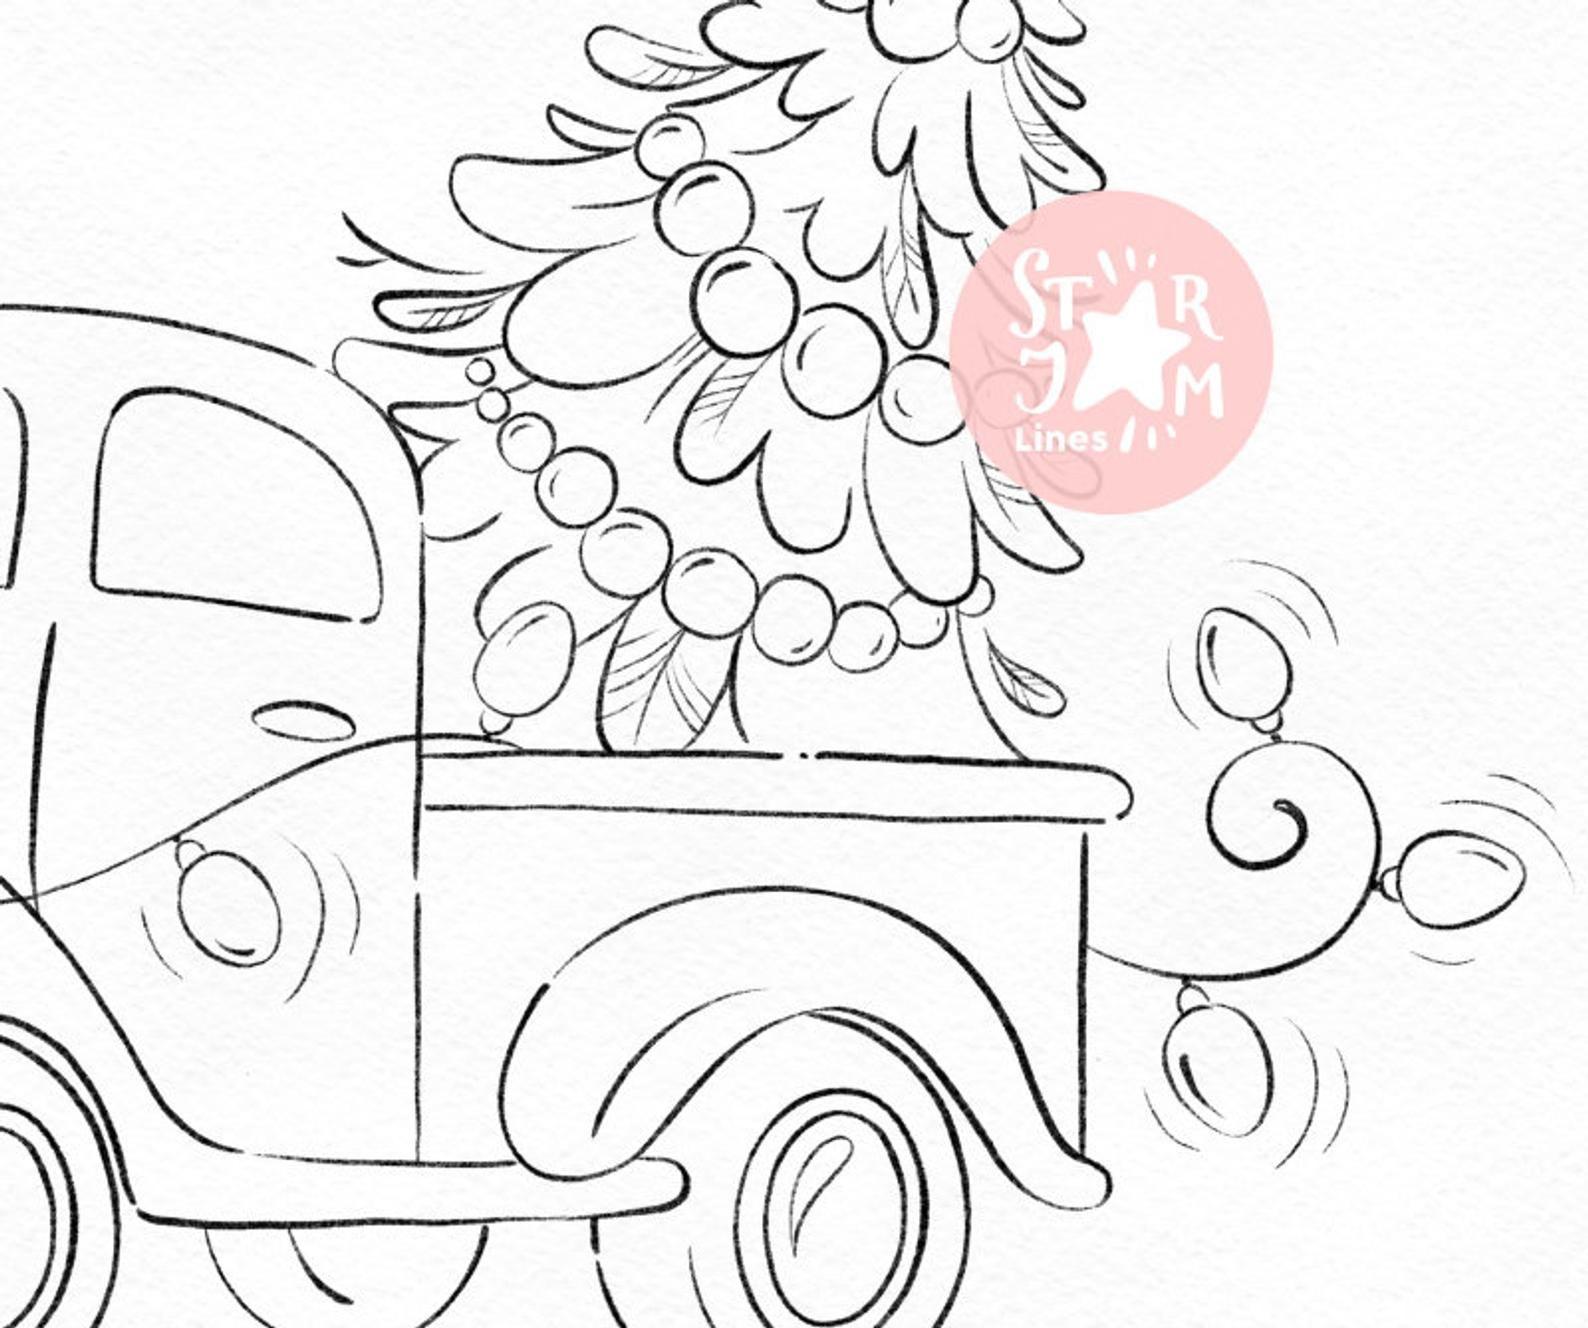 Christmas Truck Digi Stamp Tree Garland Coloring Page Etsy In 2021 Christmas Tree Coloring Page Christmas Drawing Christmas Coloring Pages